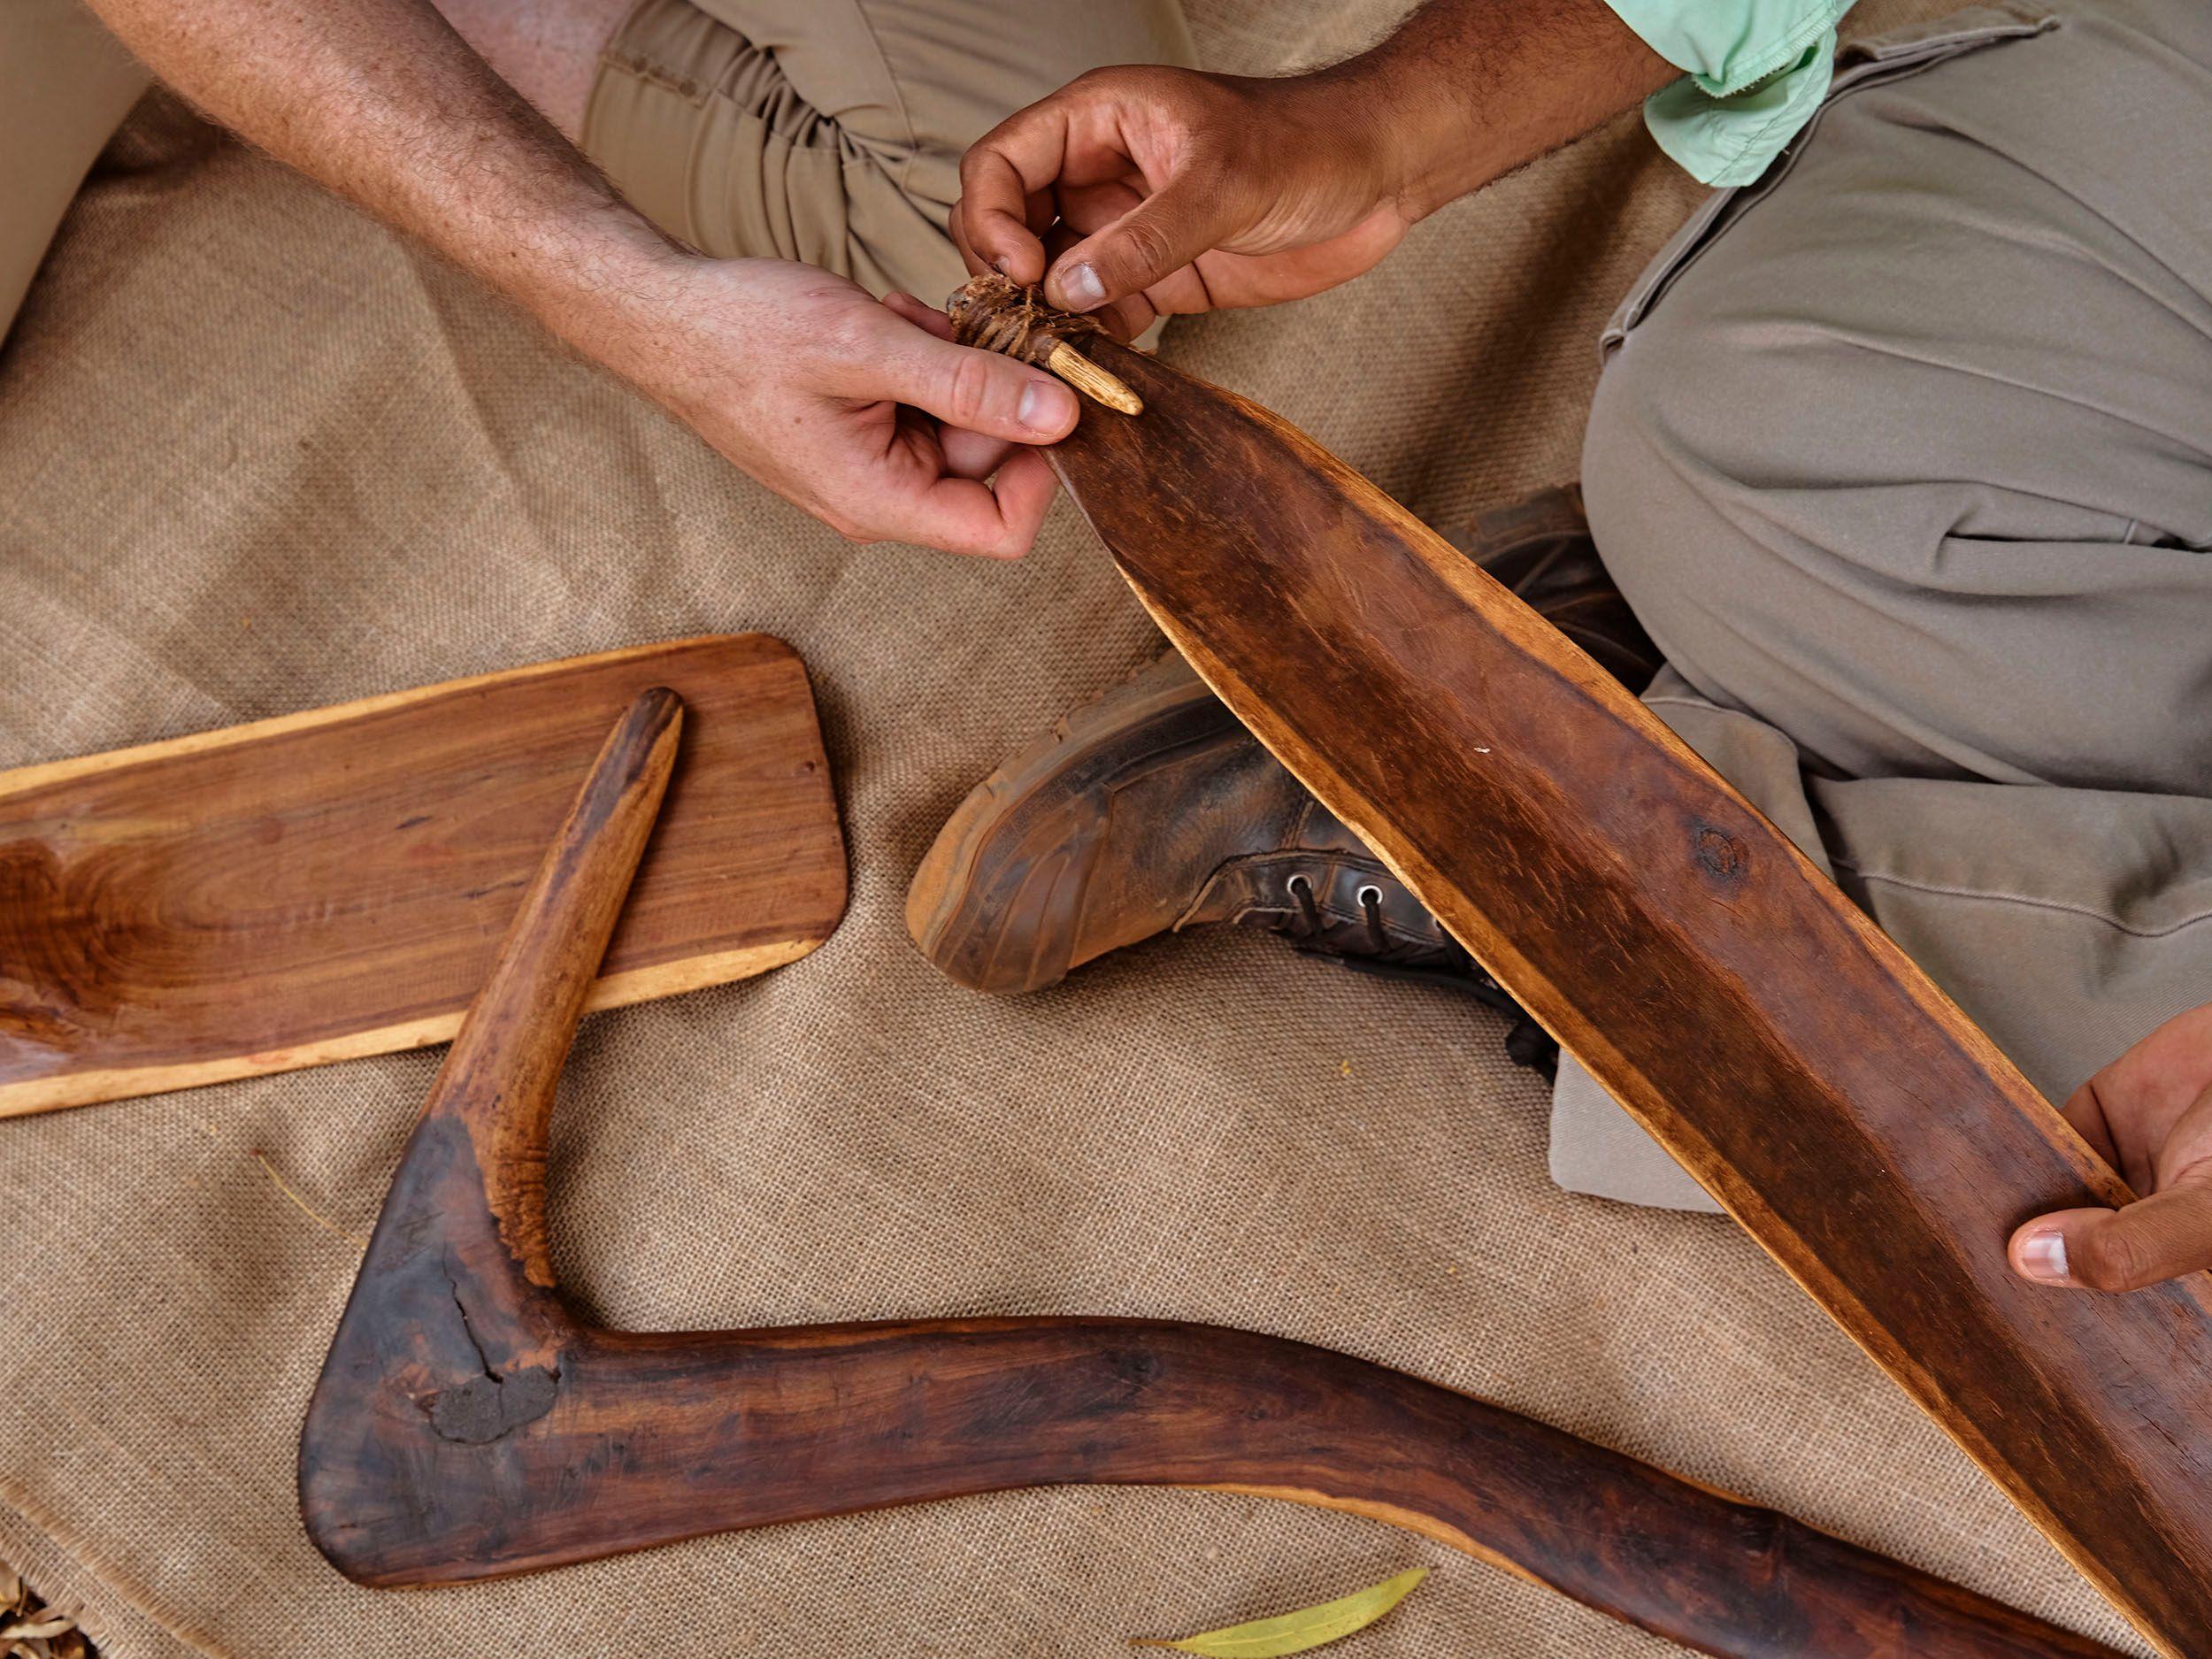 Aboriginal traditional tools